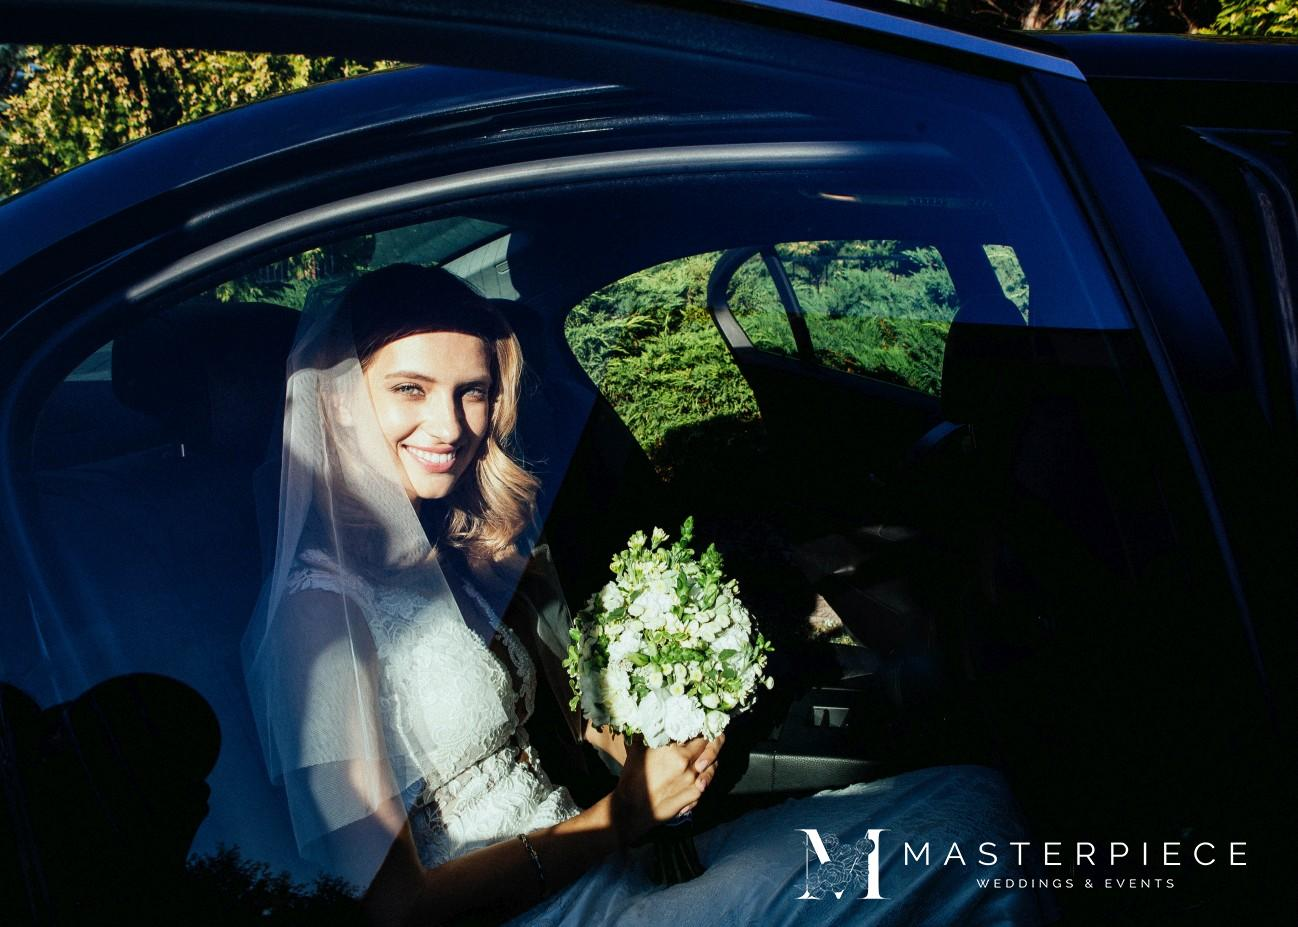 Masterpiece_Weddings_sluby_068